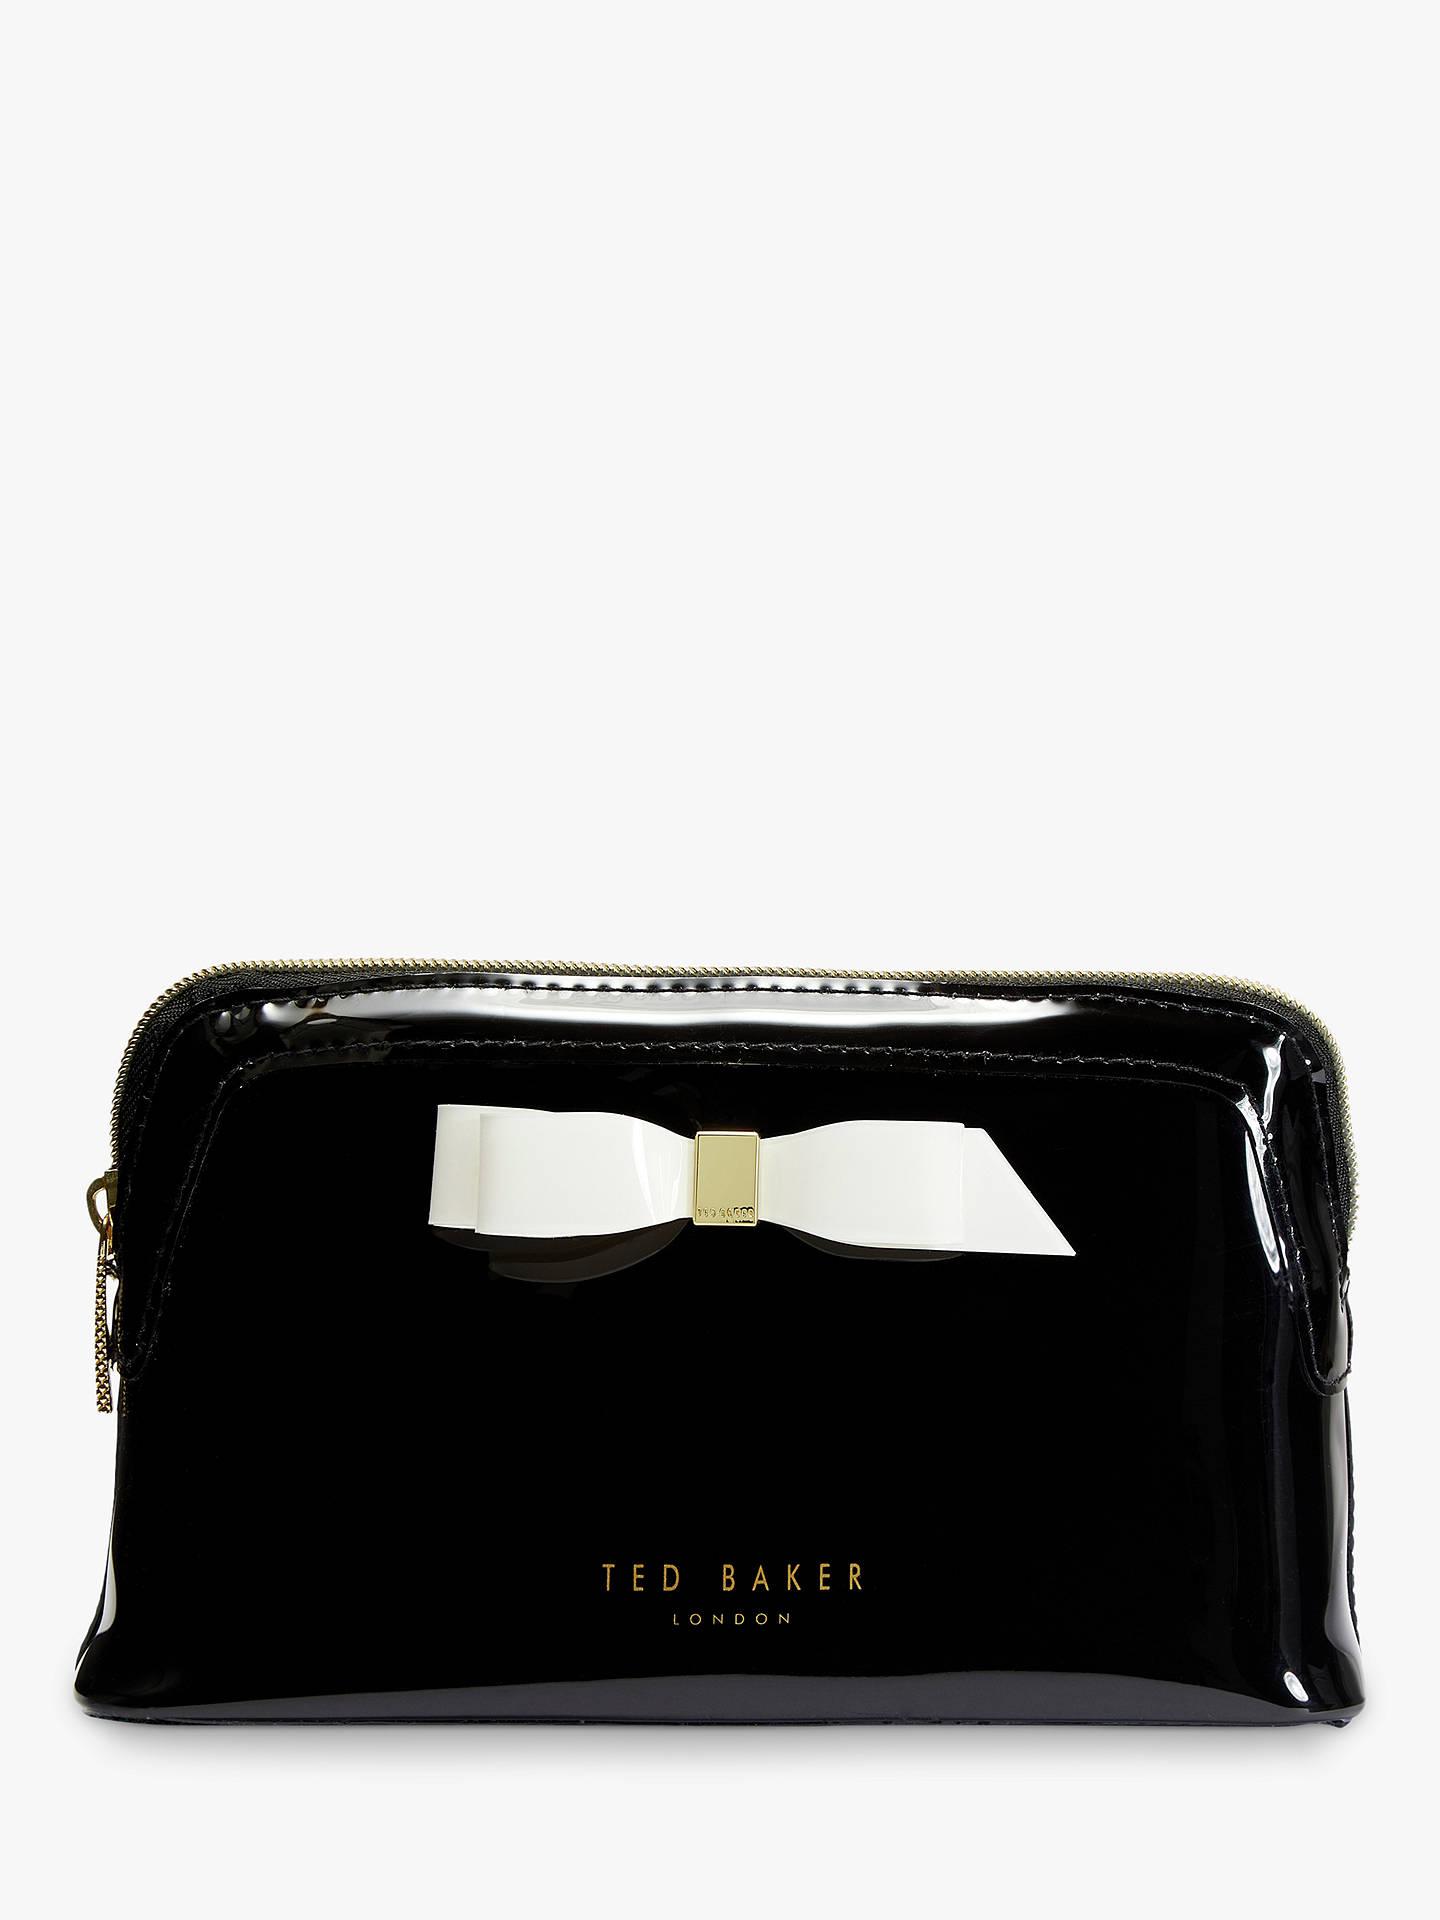 fac2971ad15 Buy Ted Baker Cahira Bow Makeup Bag, Black Online at johnlewis.com ...